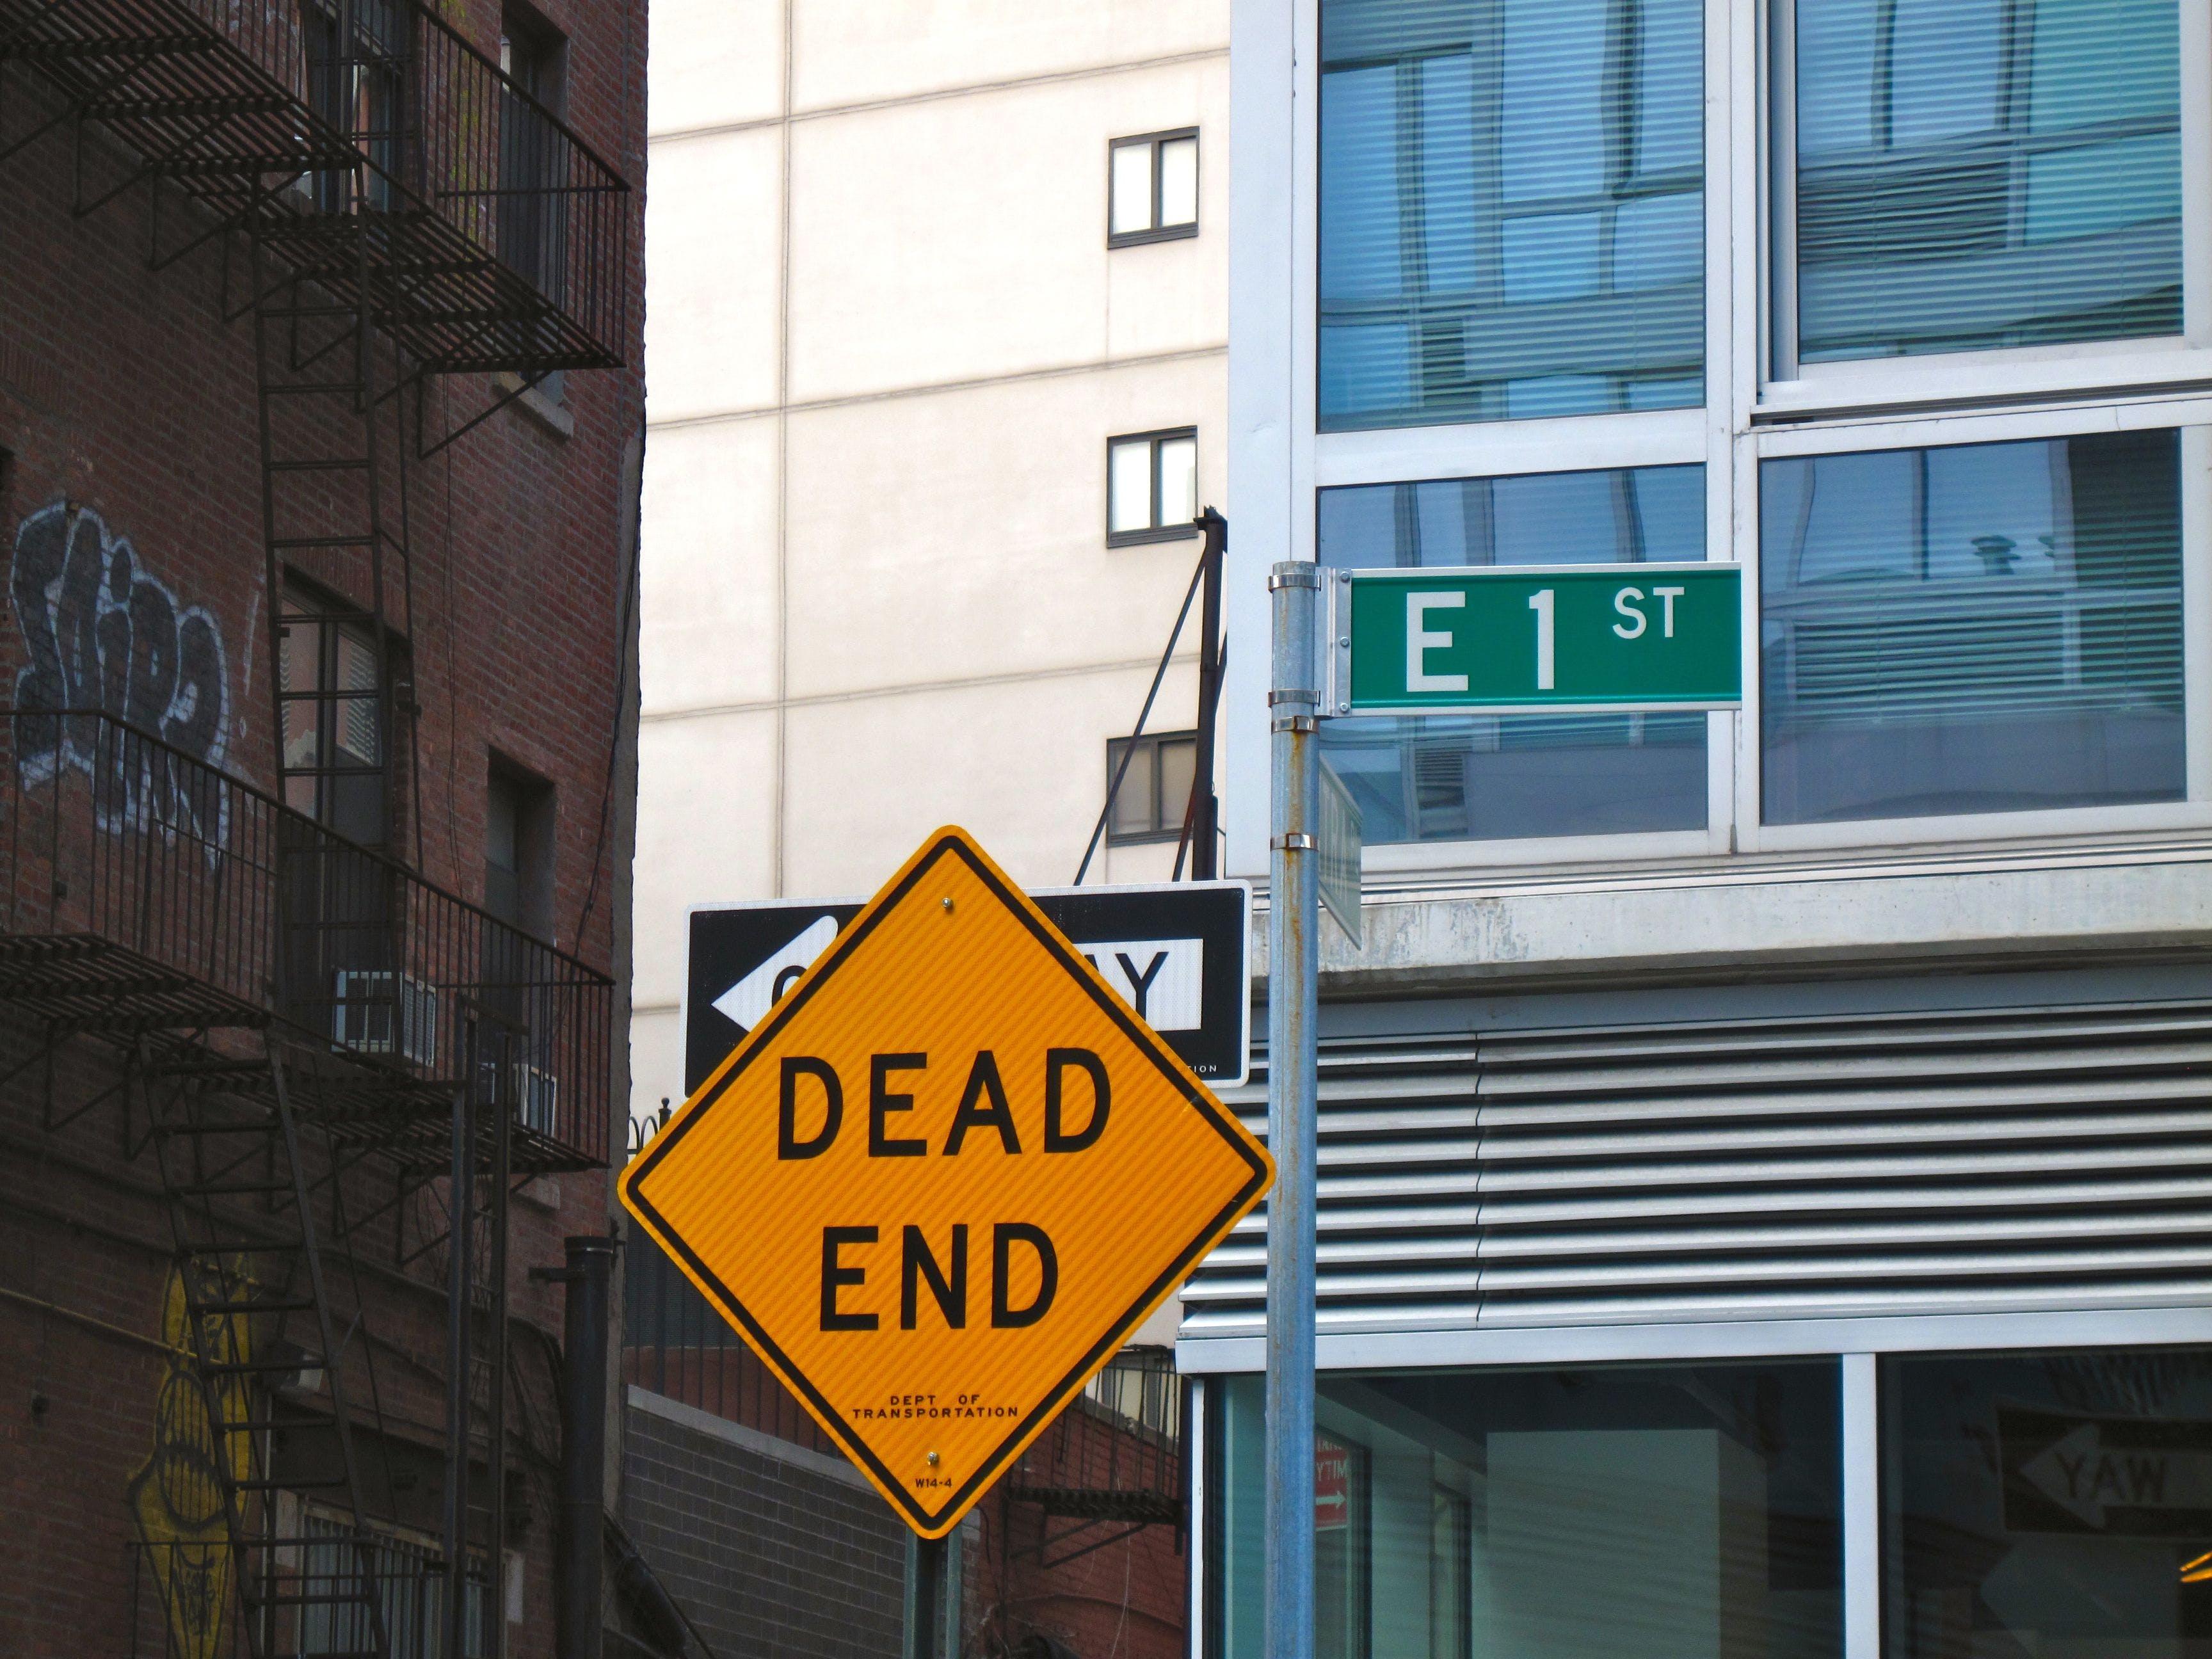 Dead End Road Signage